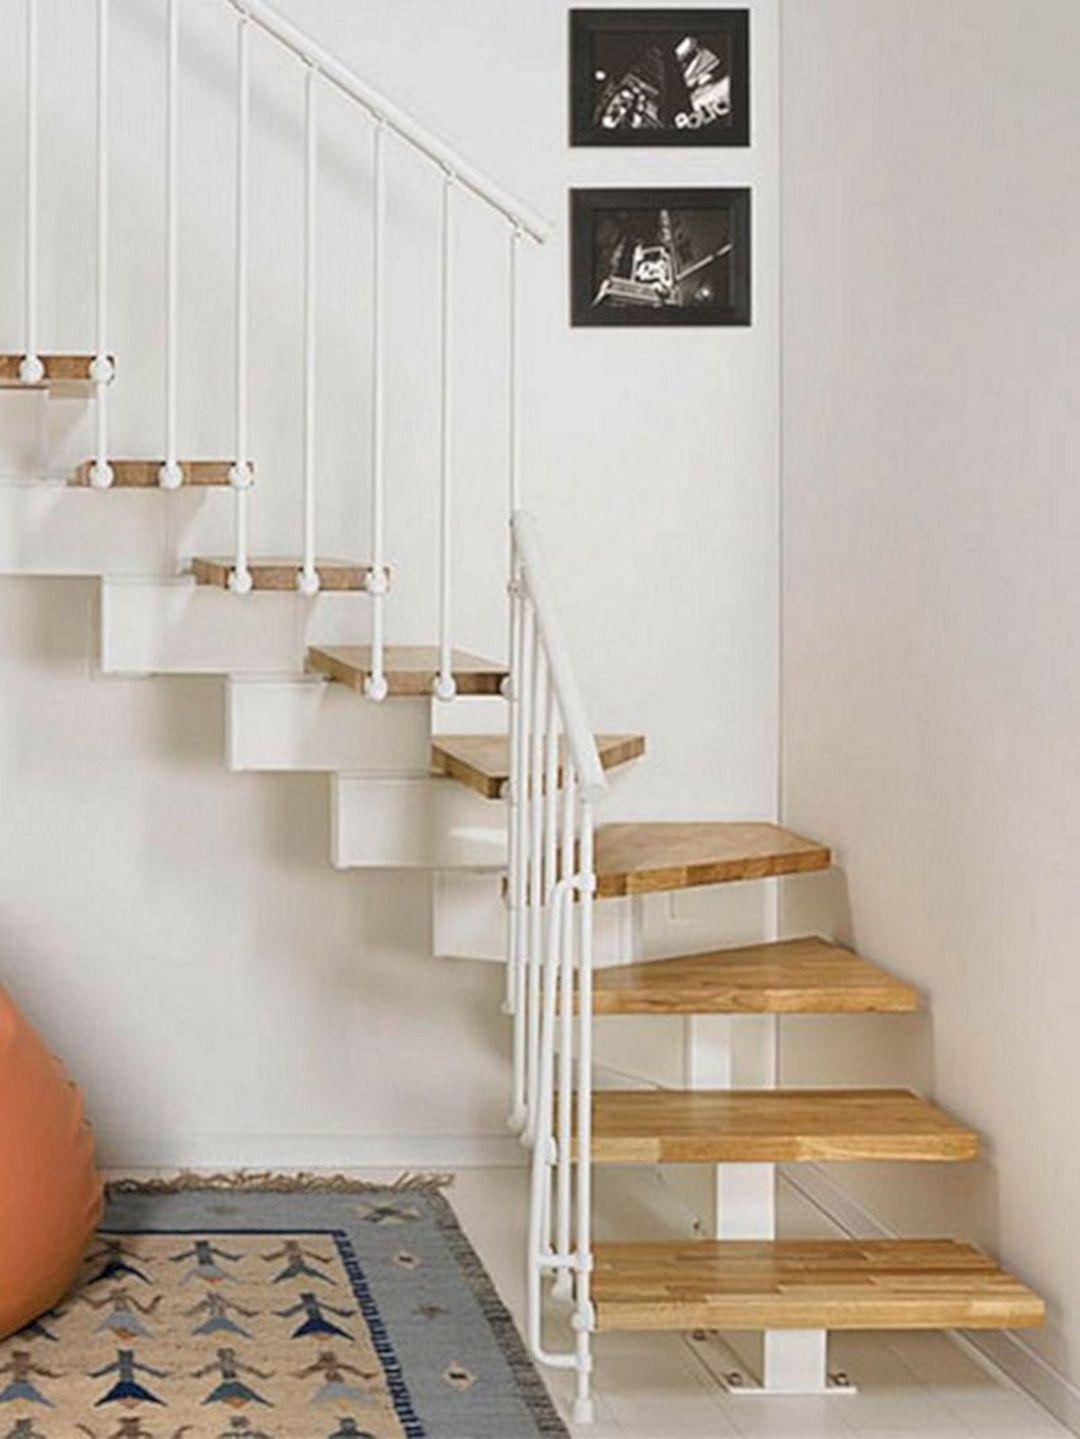 20 Amazing Stairs Design Ideas For Small Space Escadas Para